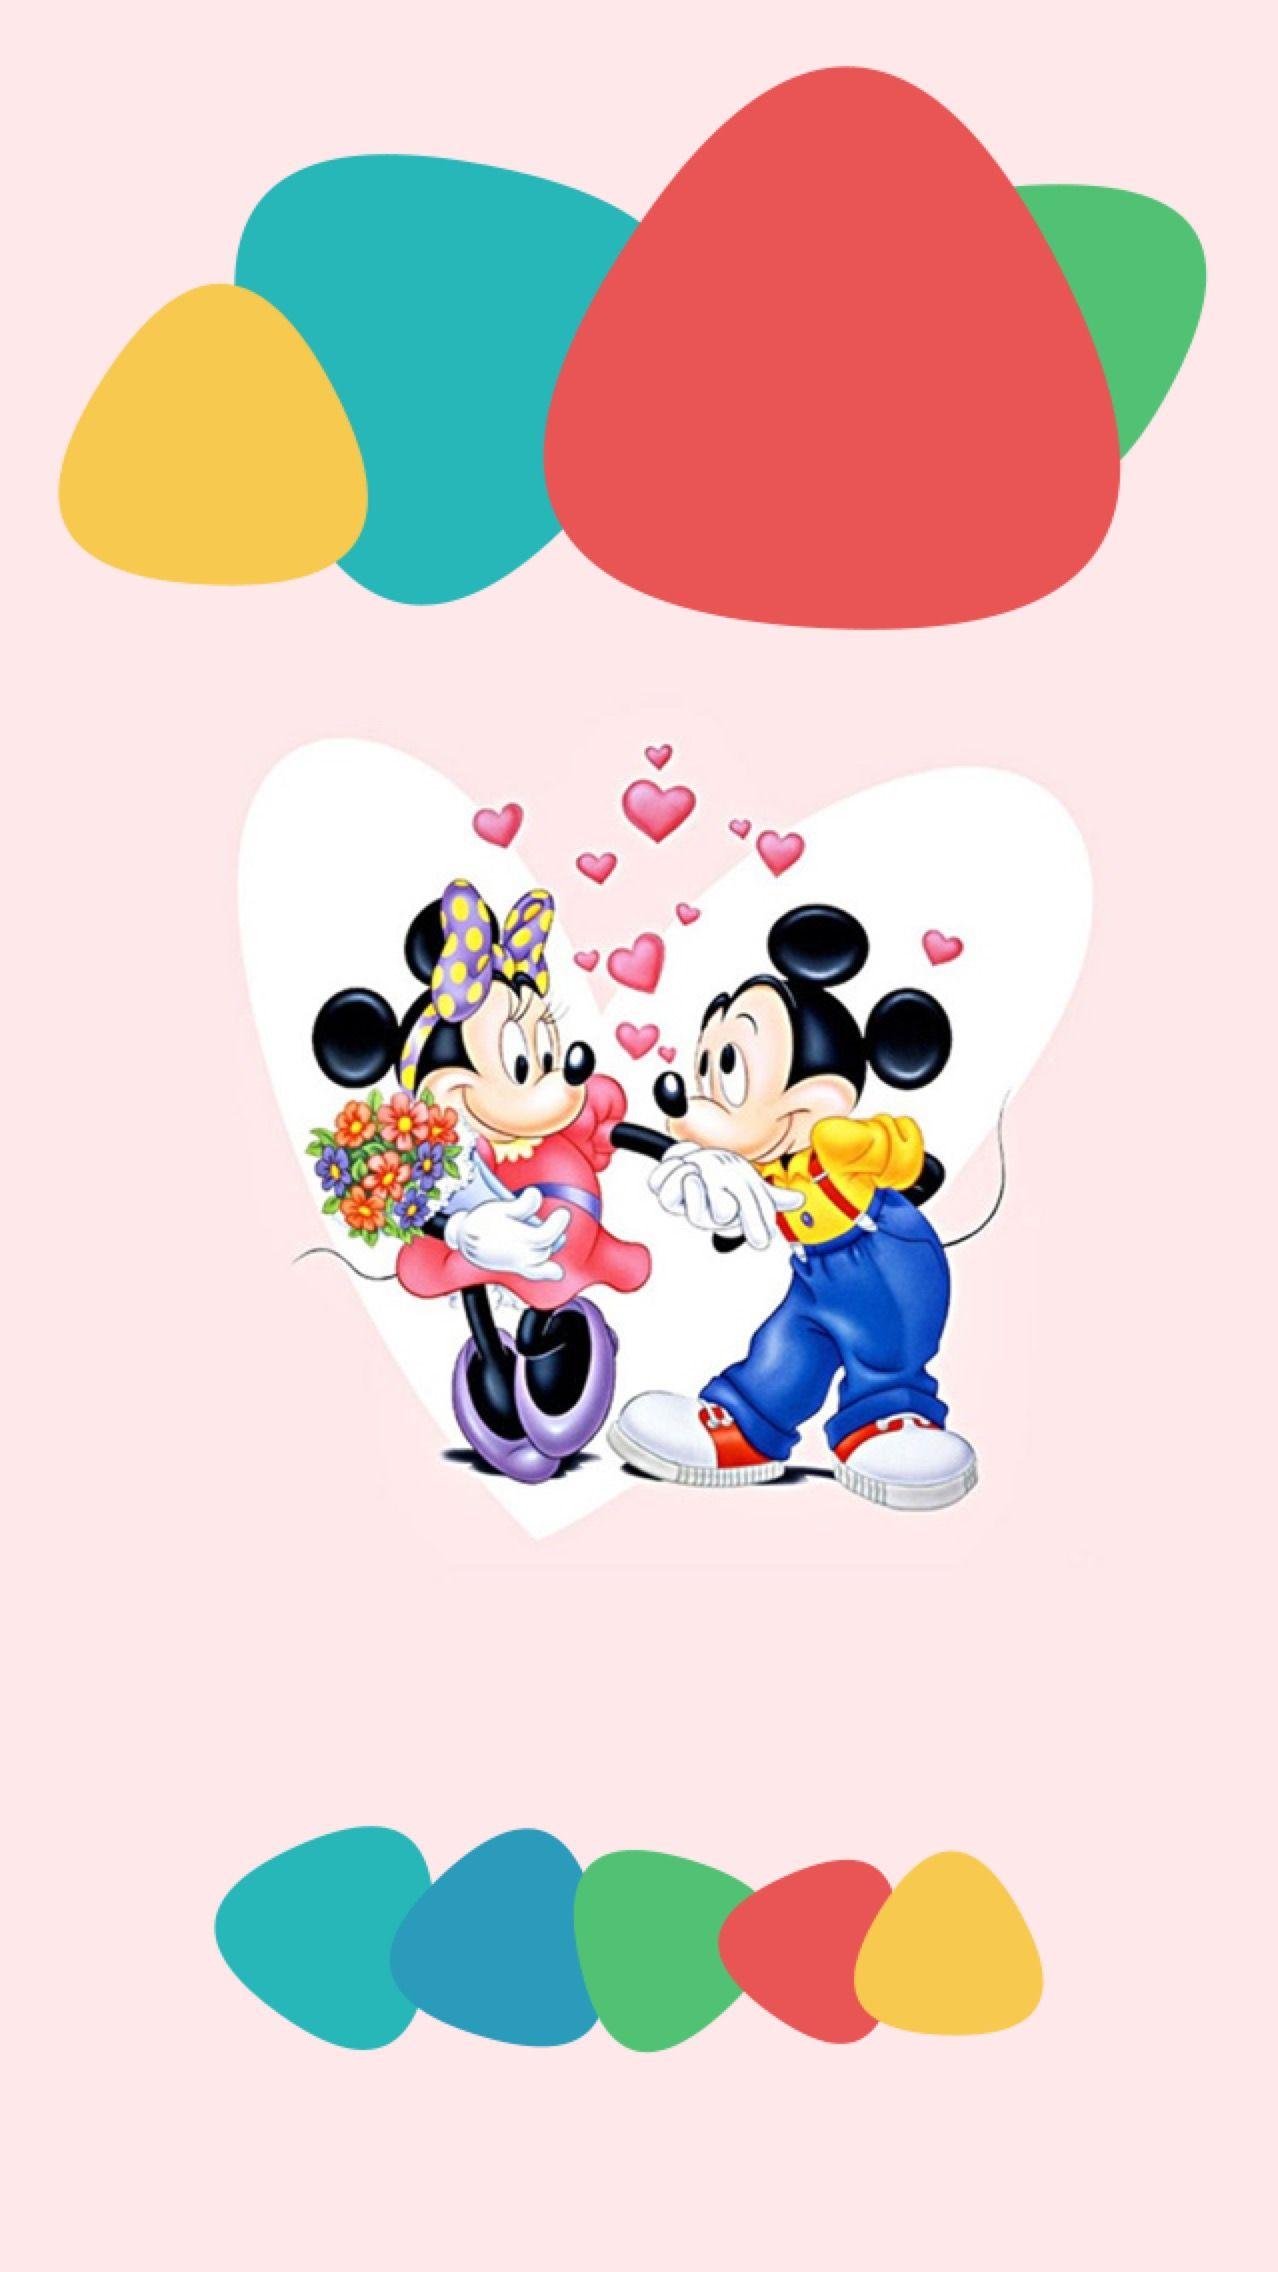 Best Get Lock Screen Iphone Couple 2020 by itunes.apple.com